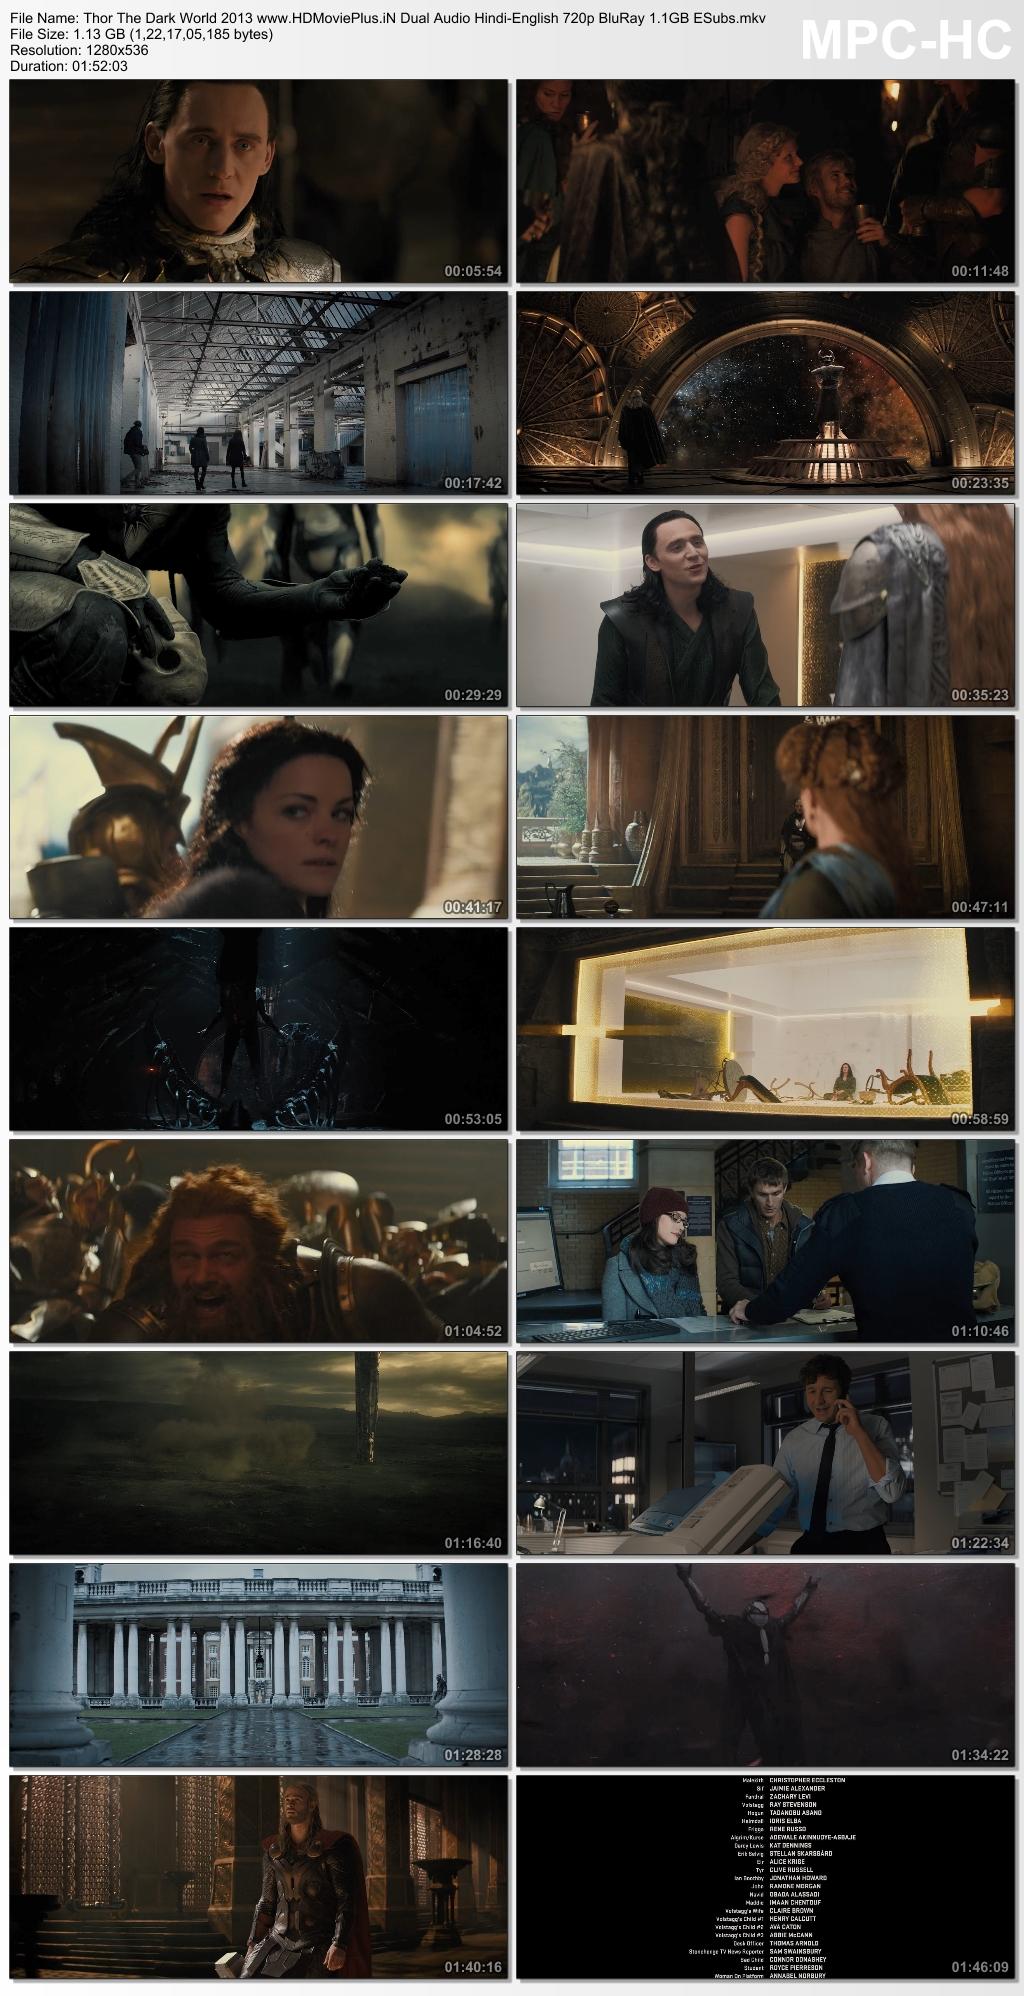 Thor: The Dark World 2013 Dual Audio